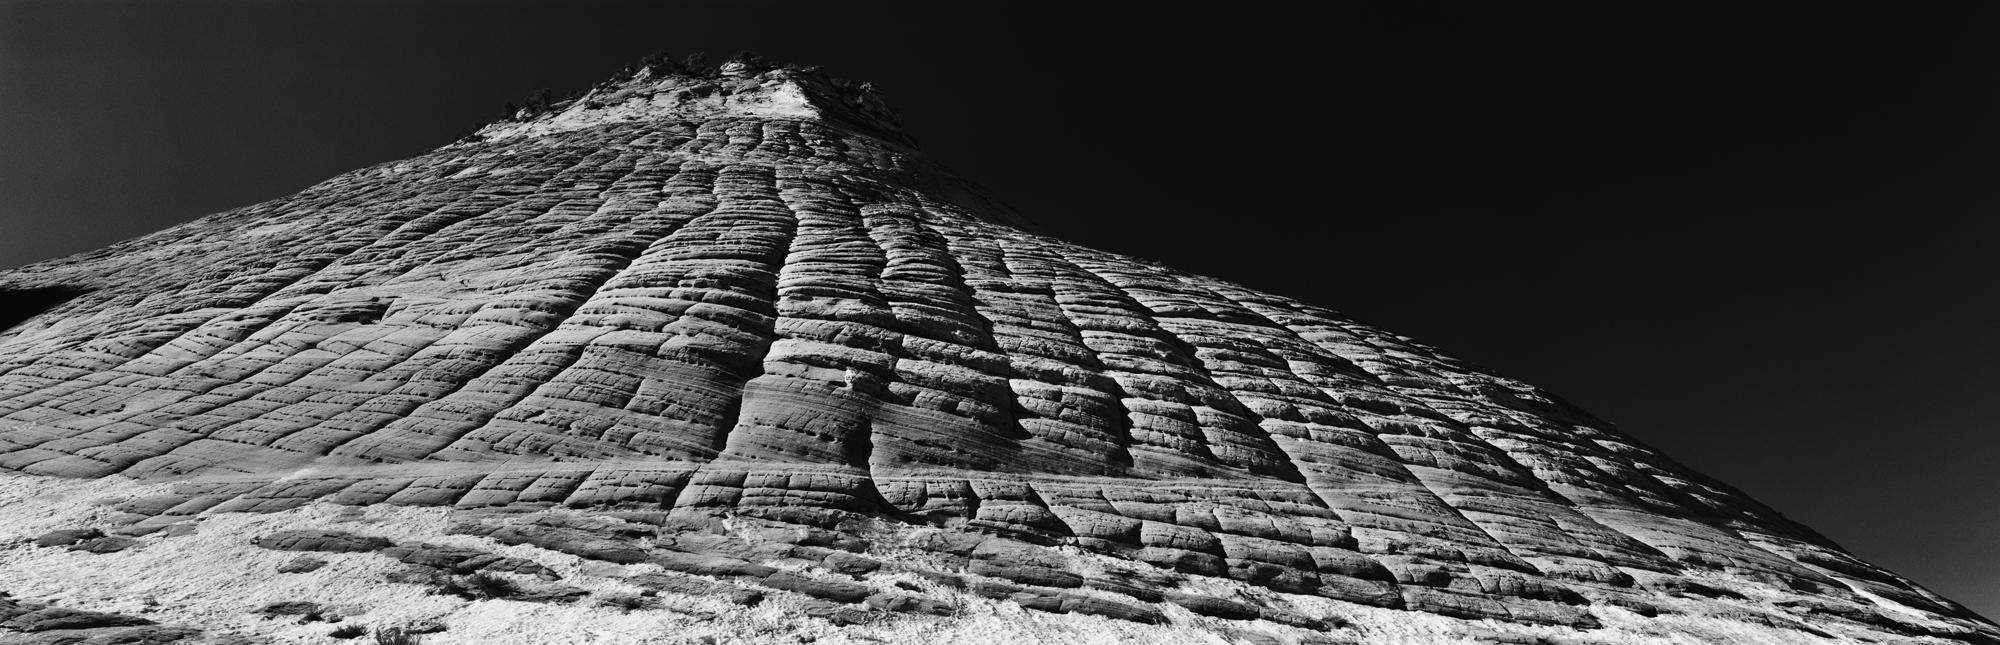 Zion National Park- Checker Board Mesa, Utah